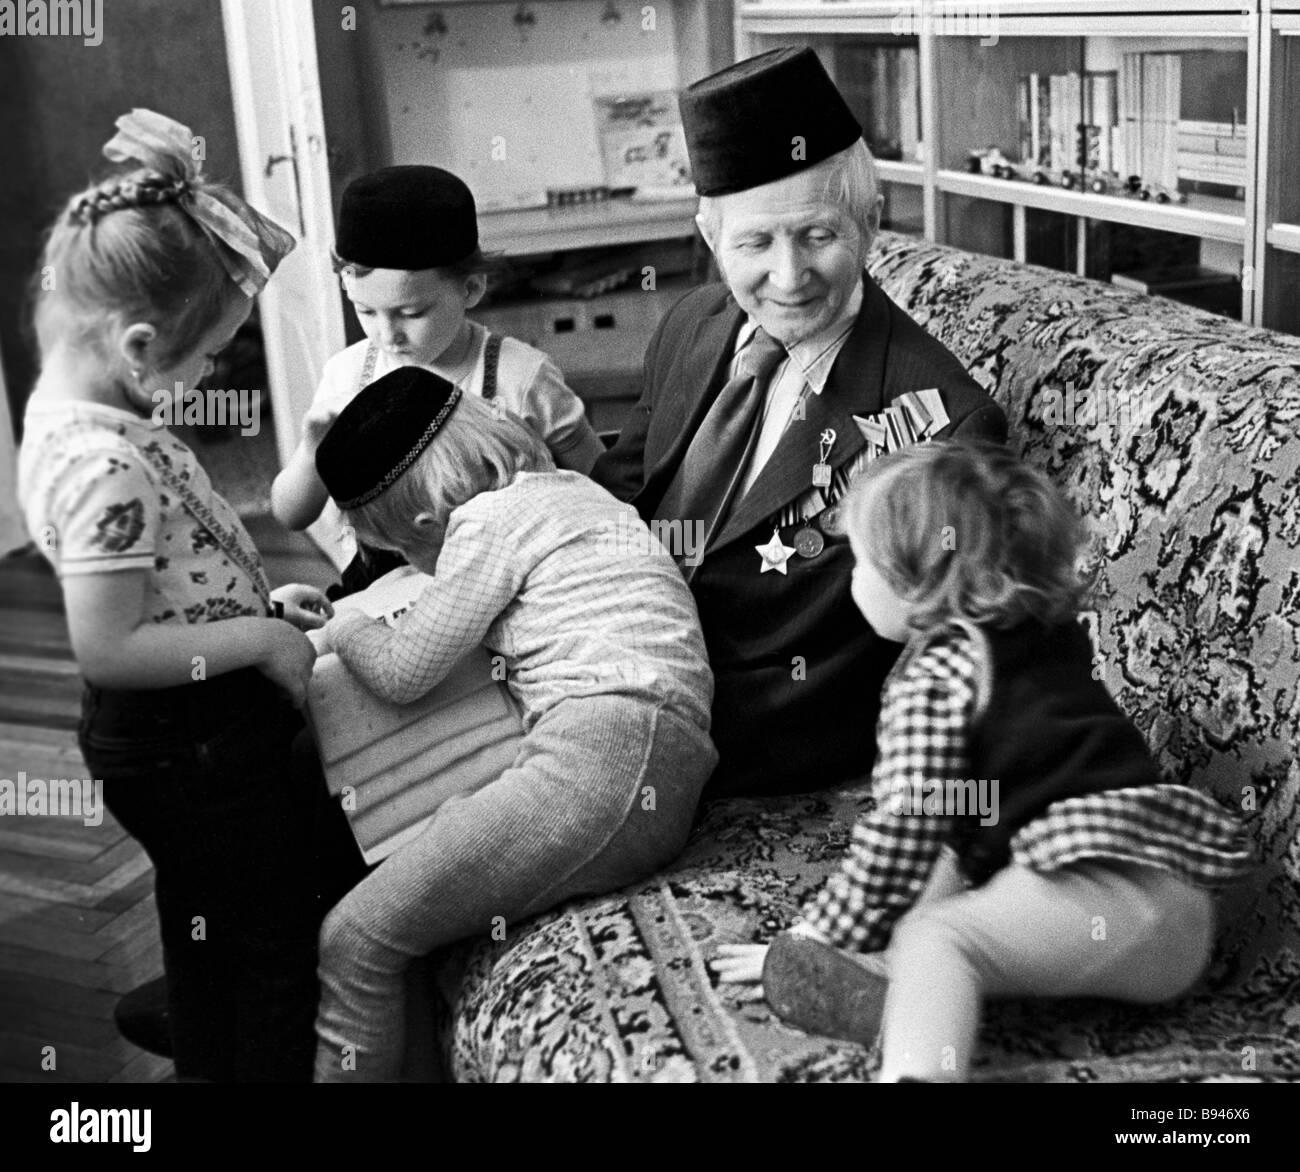 Second World War veteran Osman Brundukov with his grandchildren - Stock Image